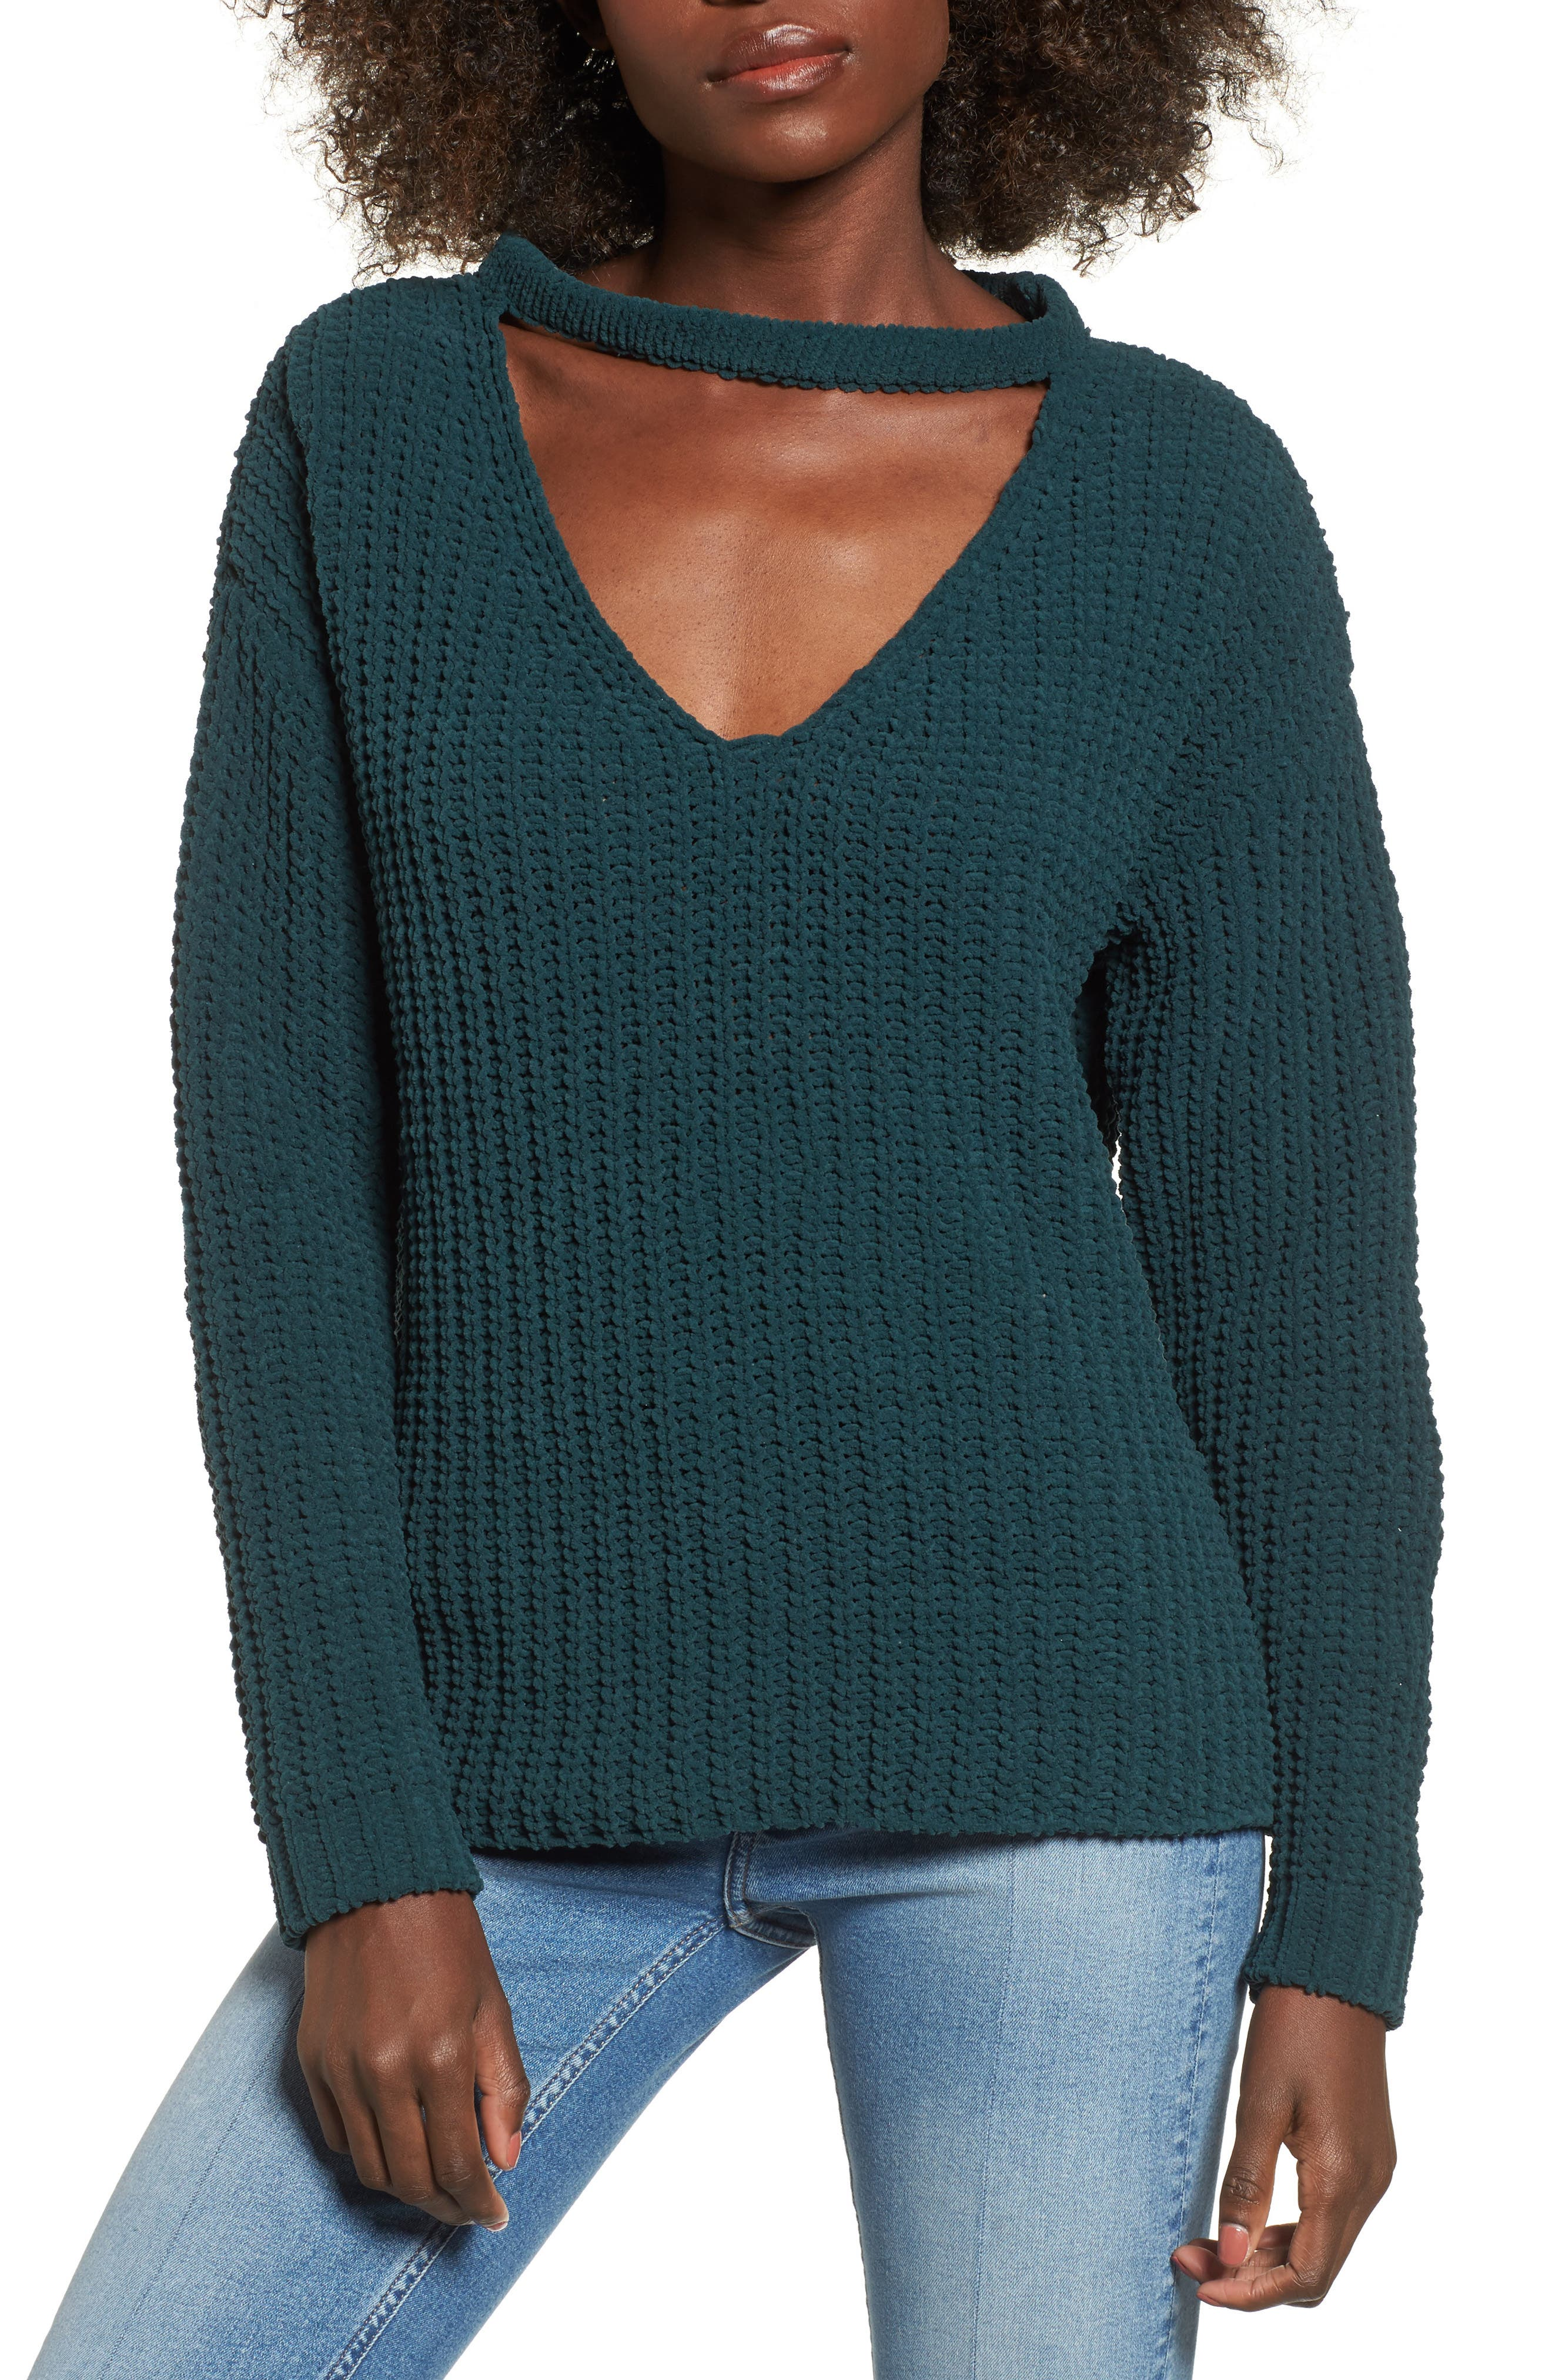 Mary Lous Choker Sweater,                             Main thumbnail 1, color,                             300